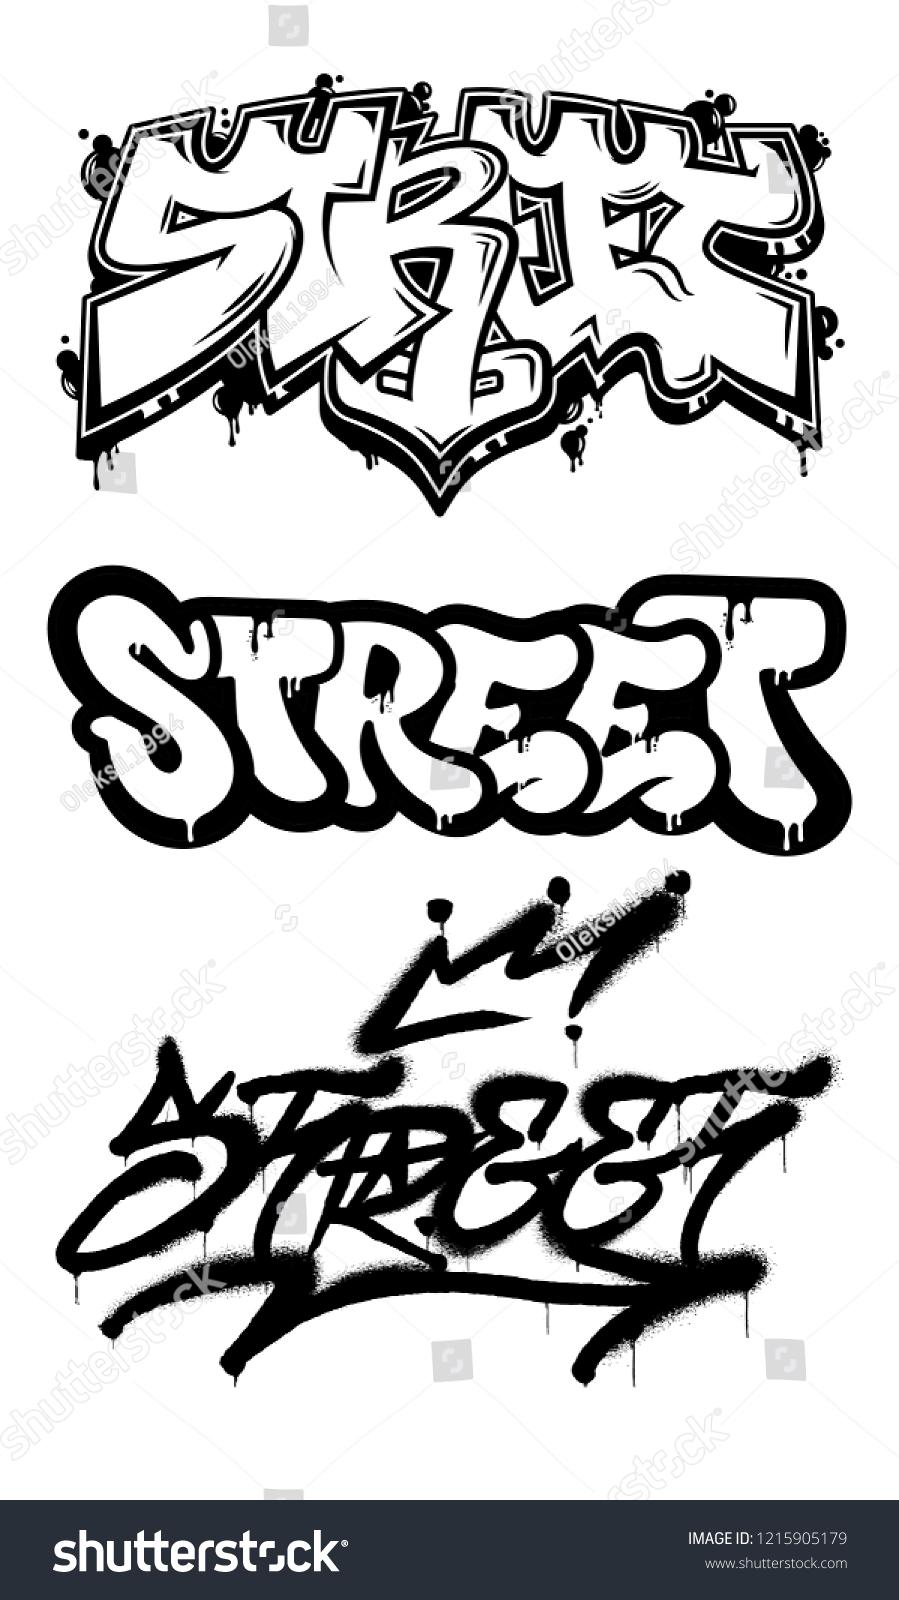 Decorative set with inscriptions street in graffiti styles on wall by using aerosol spray